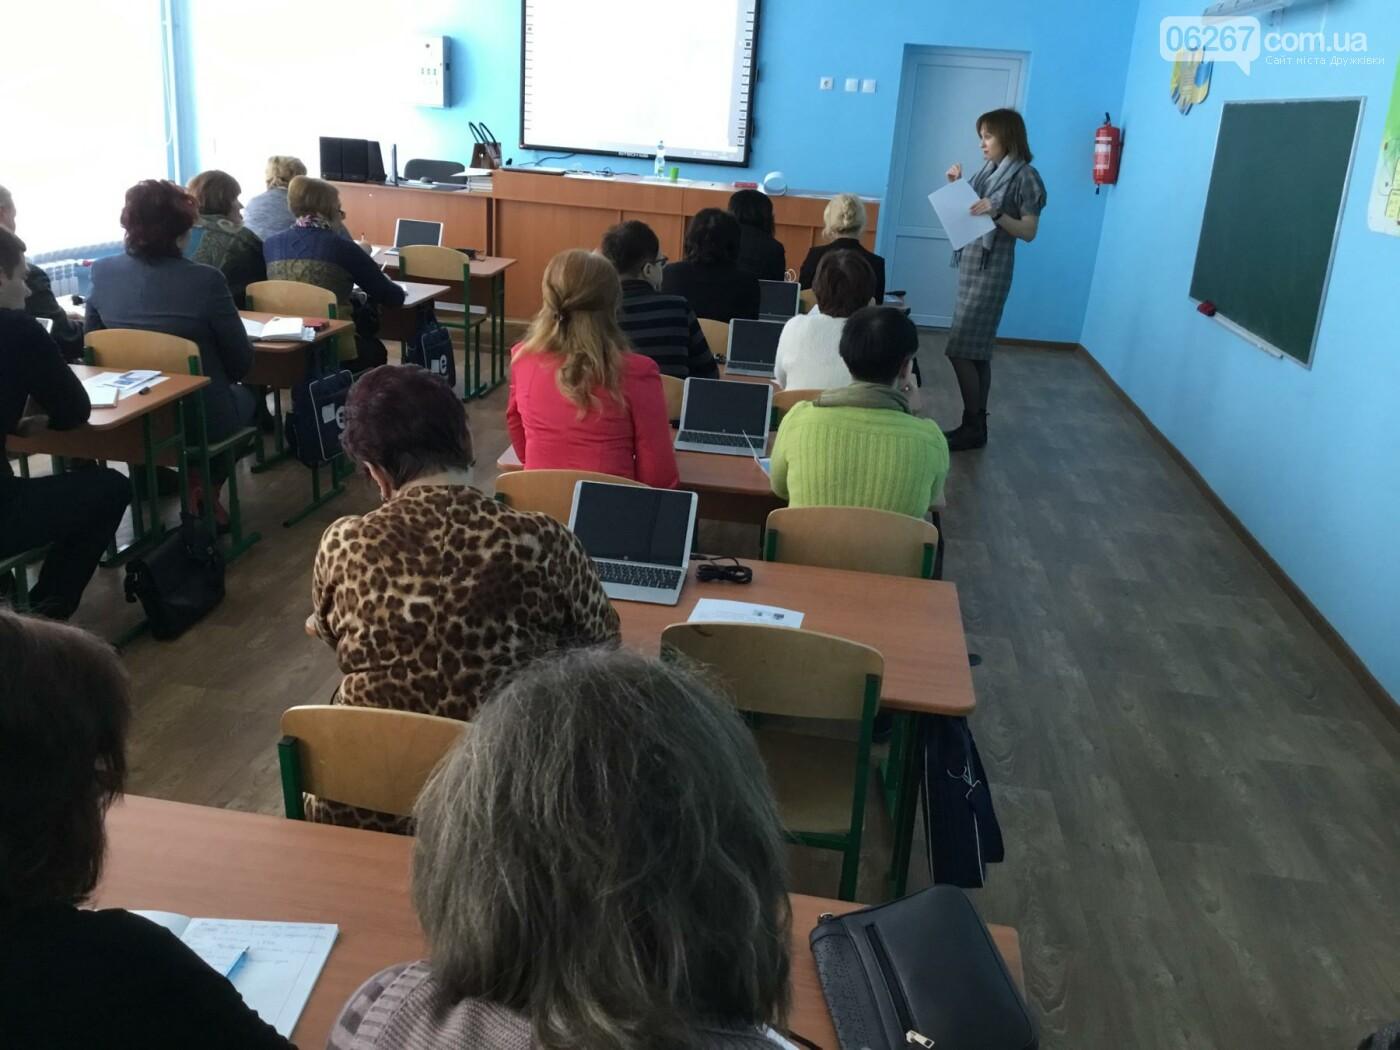 На базе дружковской ОШ №17 провели областной технопарк (ФОТО, ВИДЕО), фото-4